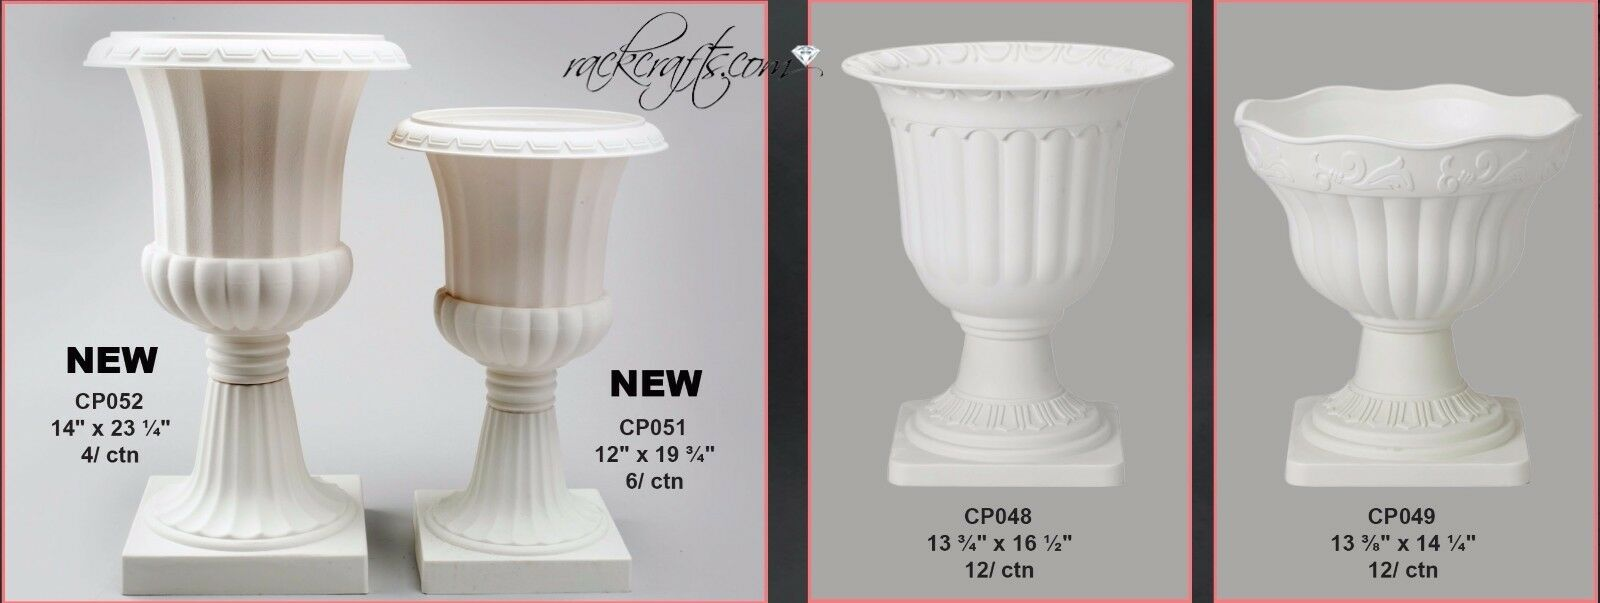 Large Rubber Plastic Roman Greek Planters Pots Urns Vases Plants Wedding Garden